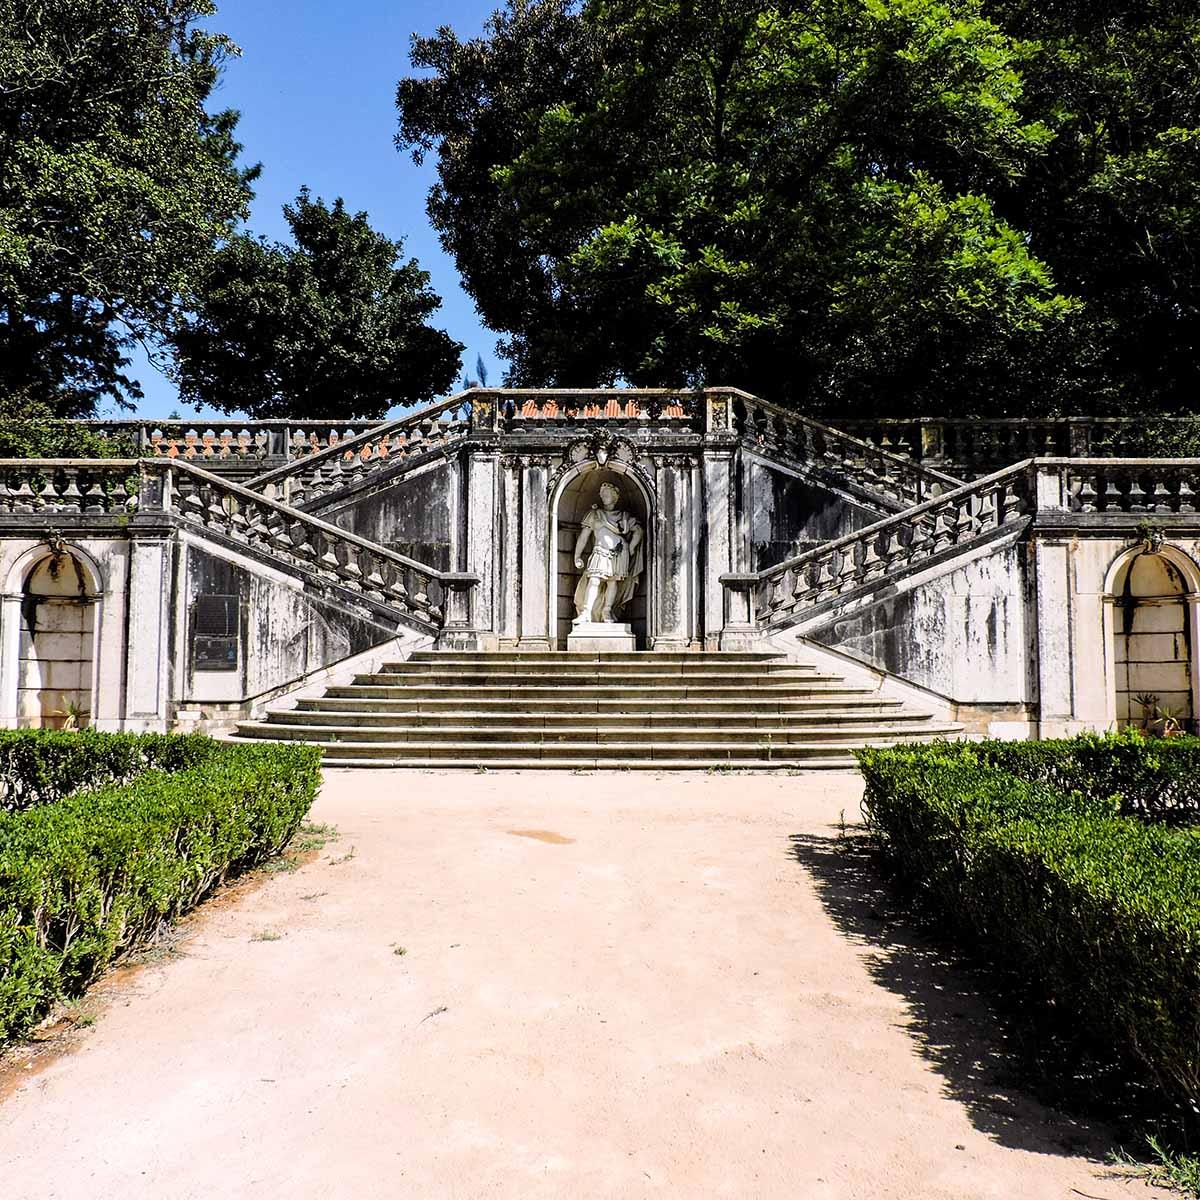 Jardim Botanico da Ajuda stairs in Belem